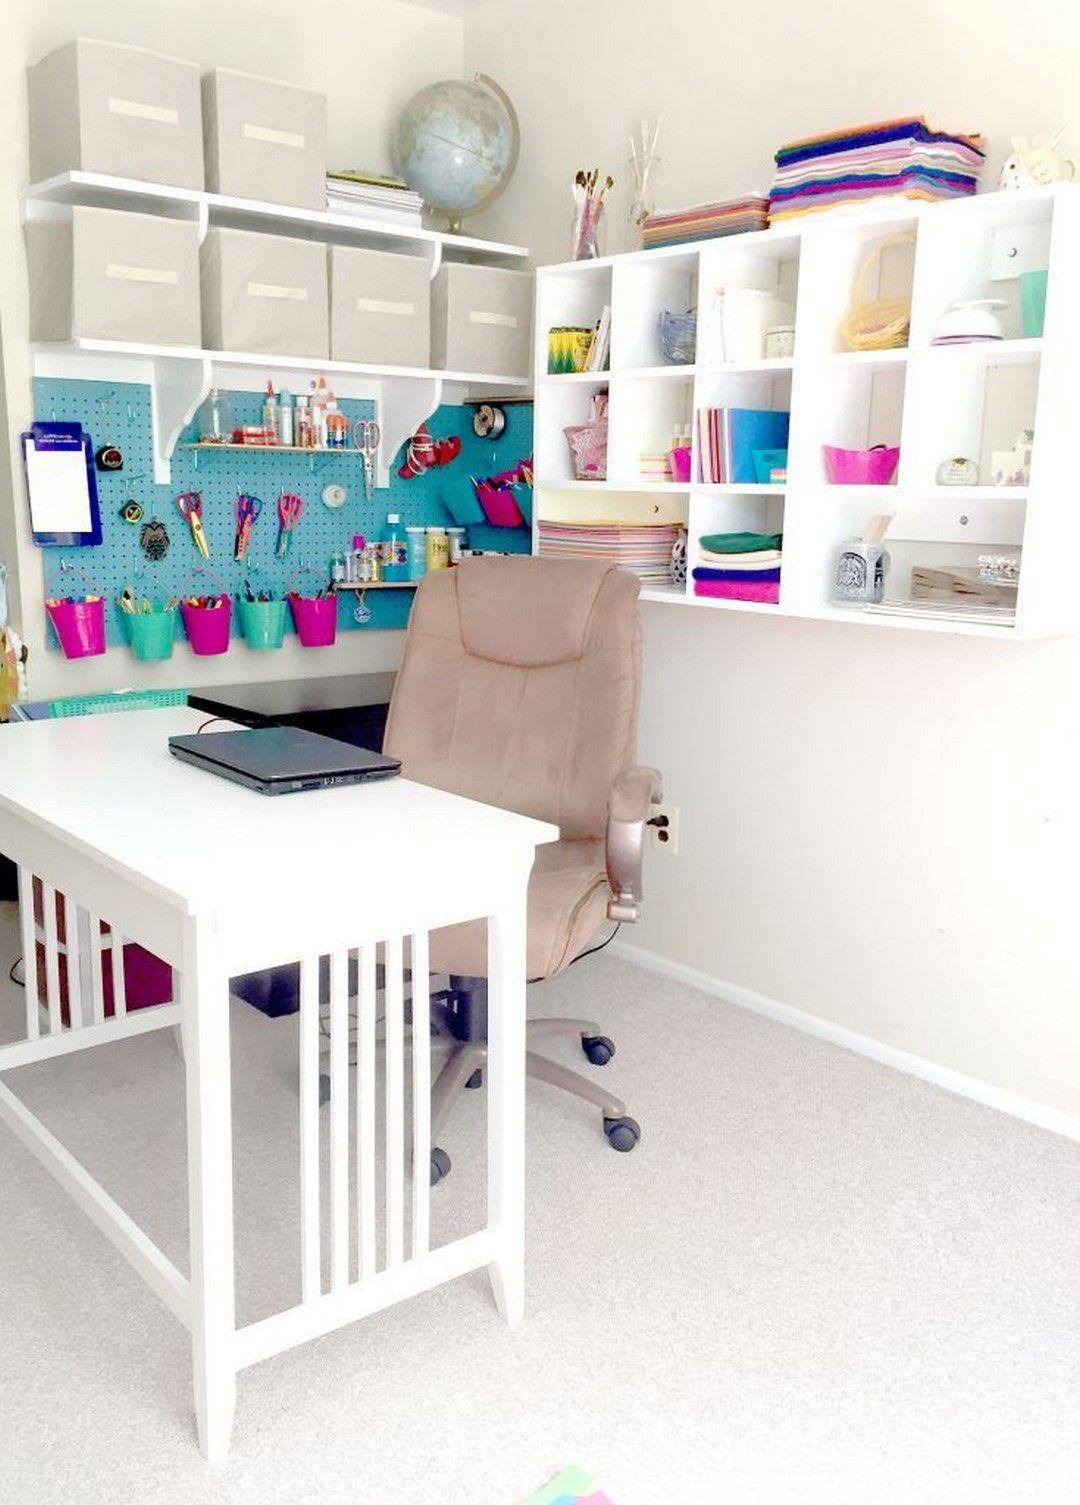 21 Free Plans DIY Kids Room Storage Idea images